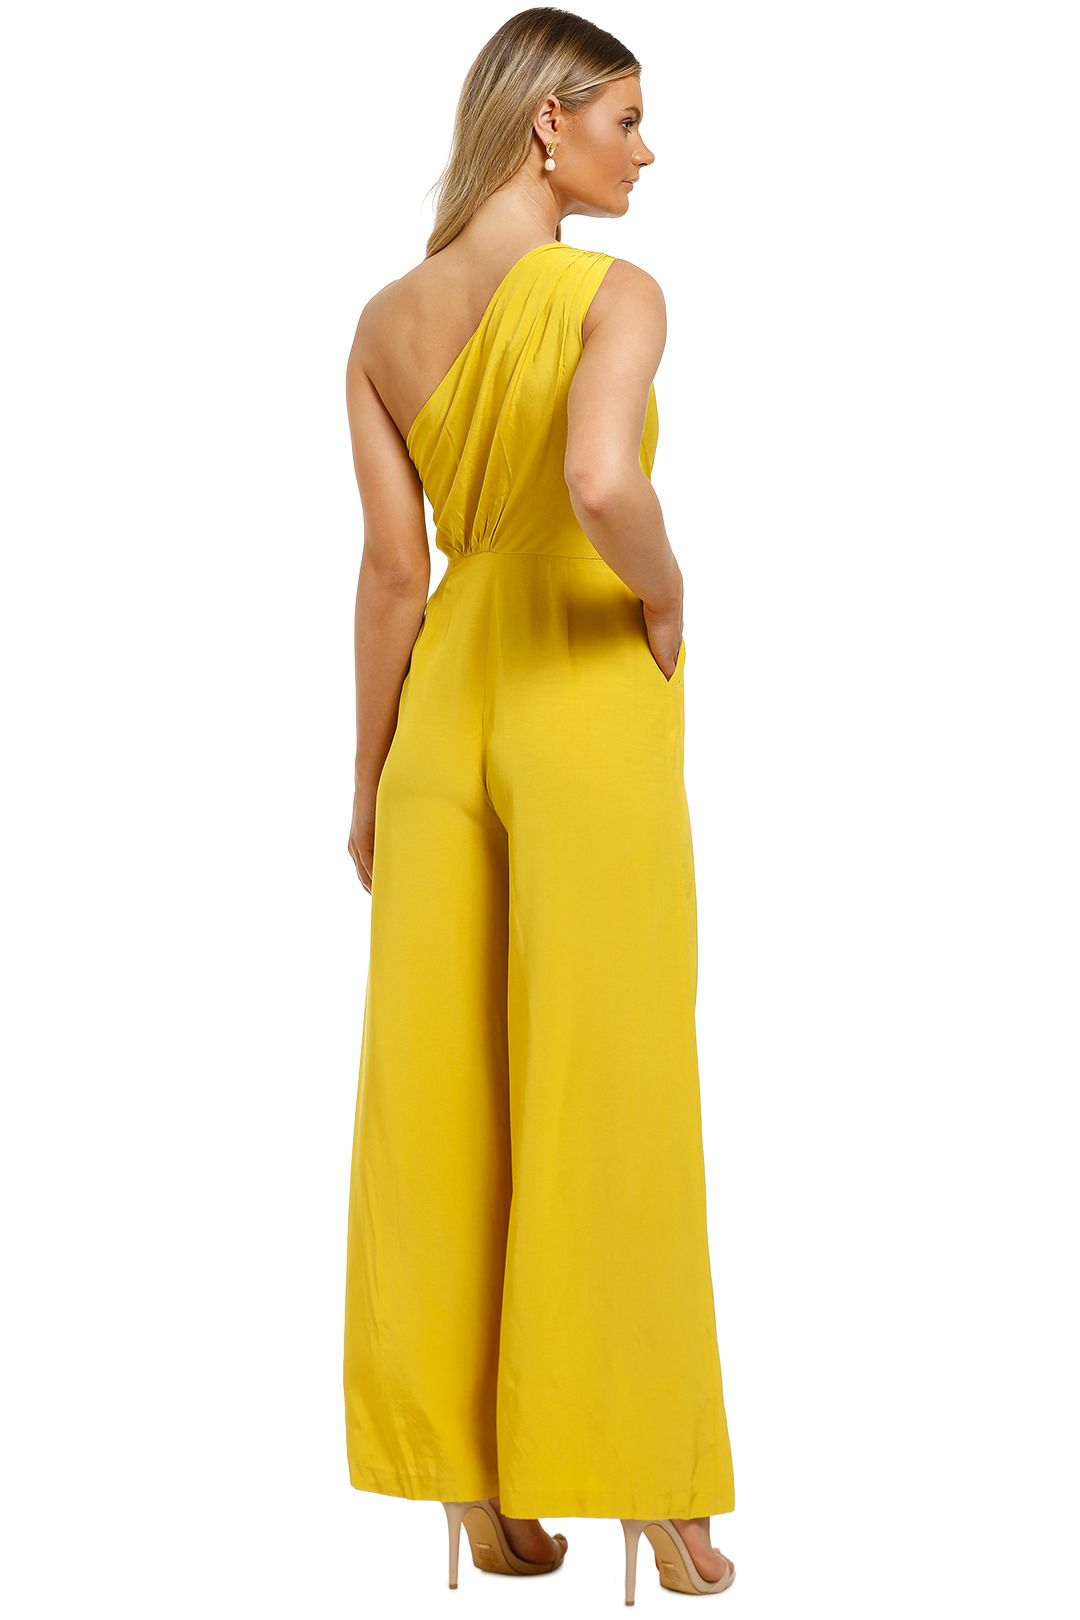 Vestire-Pretty-Hurts-Jumpsuit-Mustard-Back